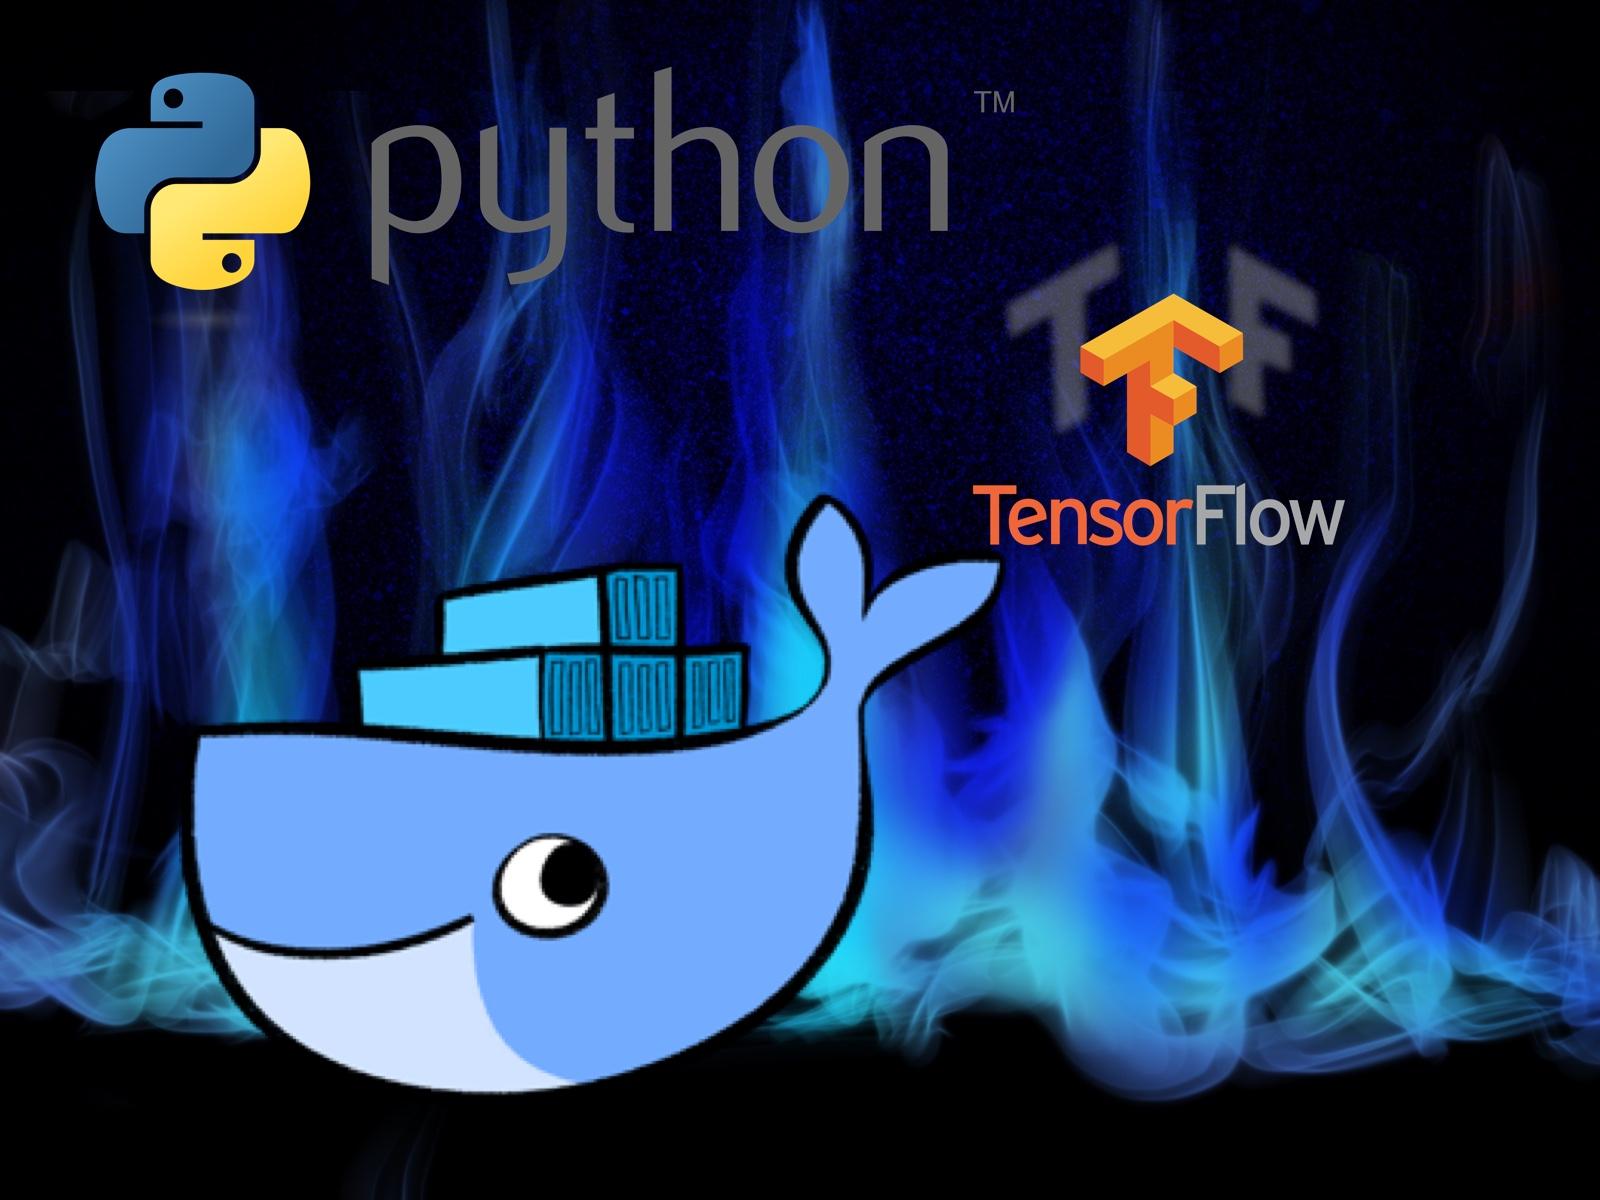 Docker_python_tensorflow_yolov2